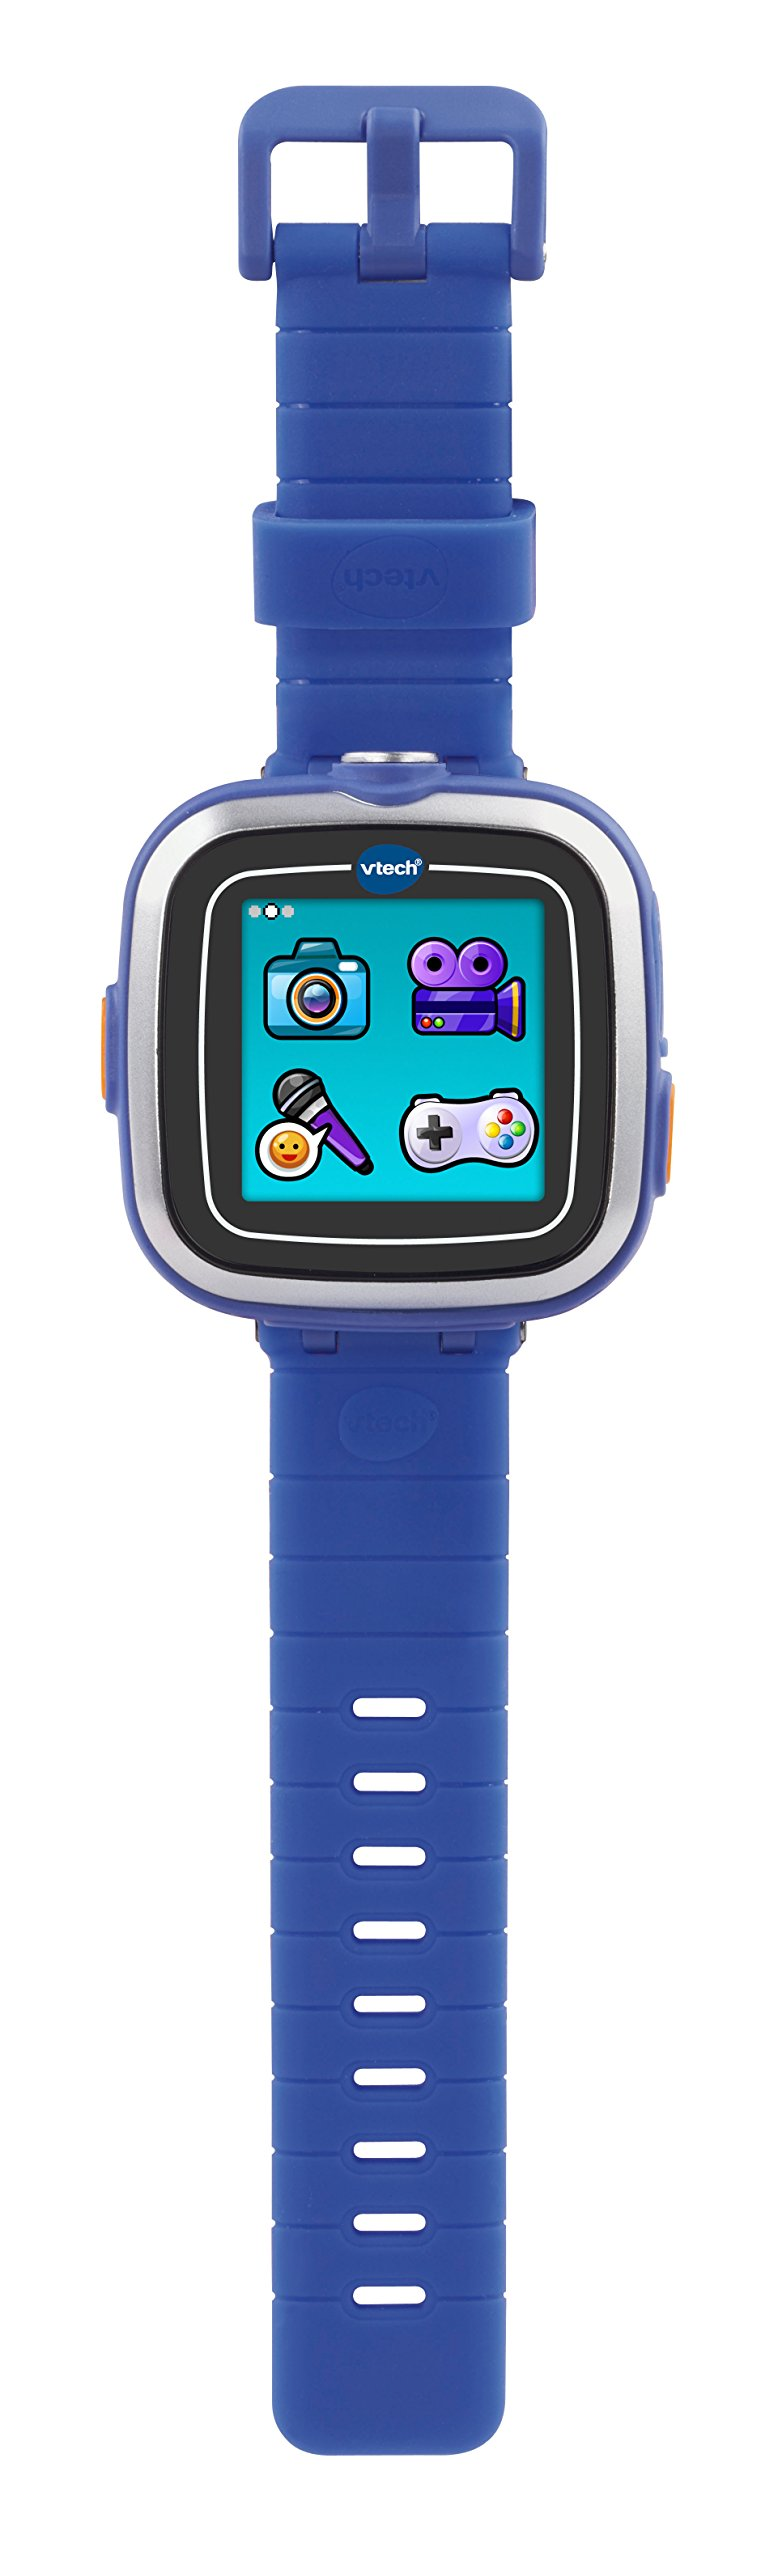 VTech Kidizoom Smartwatch, Blue (Discontinued by manufacturer) by VTech Kidizoom (Image #2)